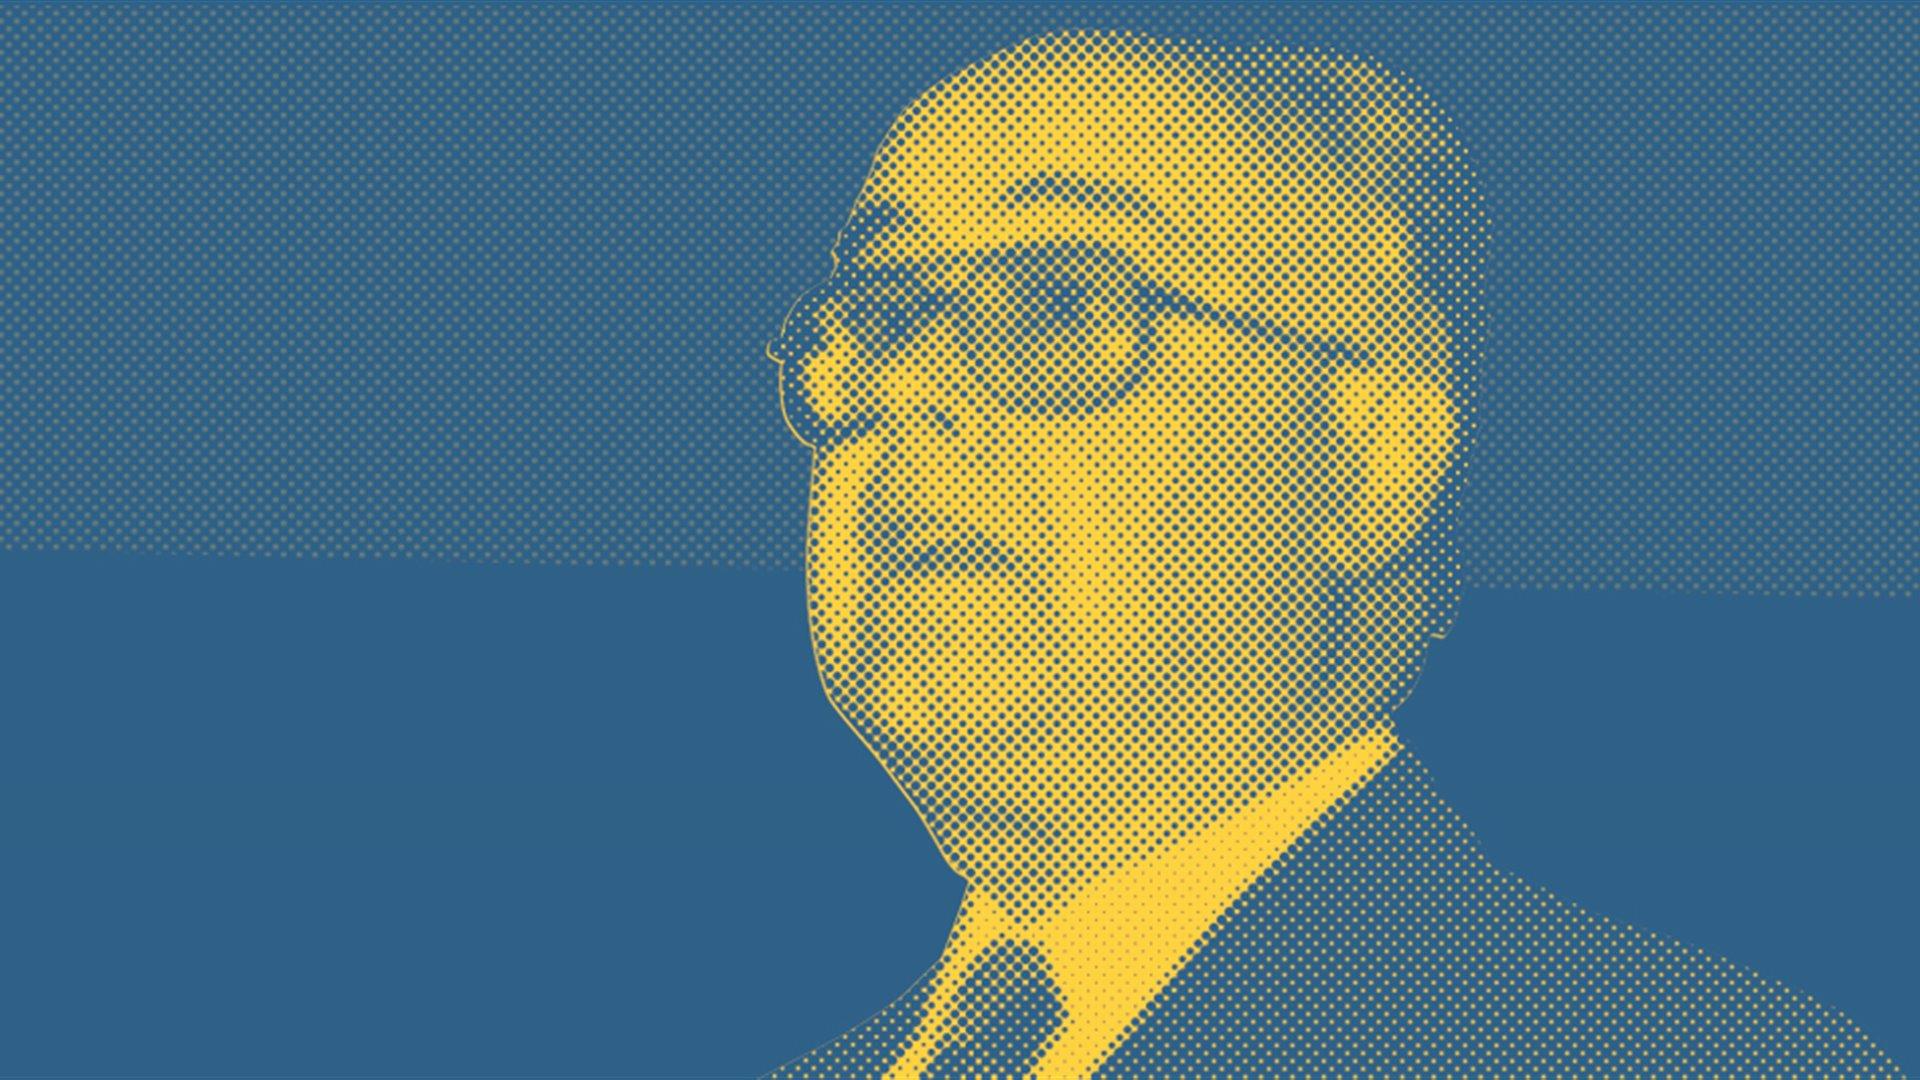 Francisco Márquez Villanueva en diálogo con Ricardo García Cárcel